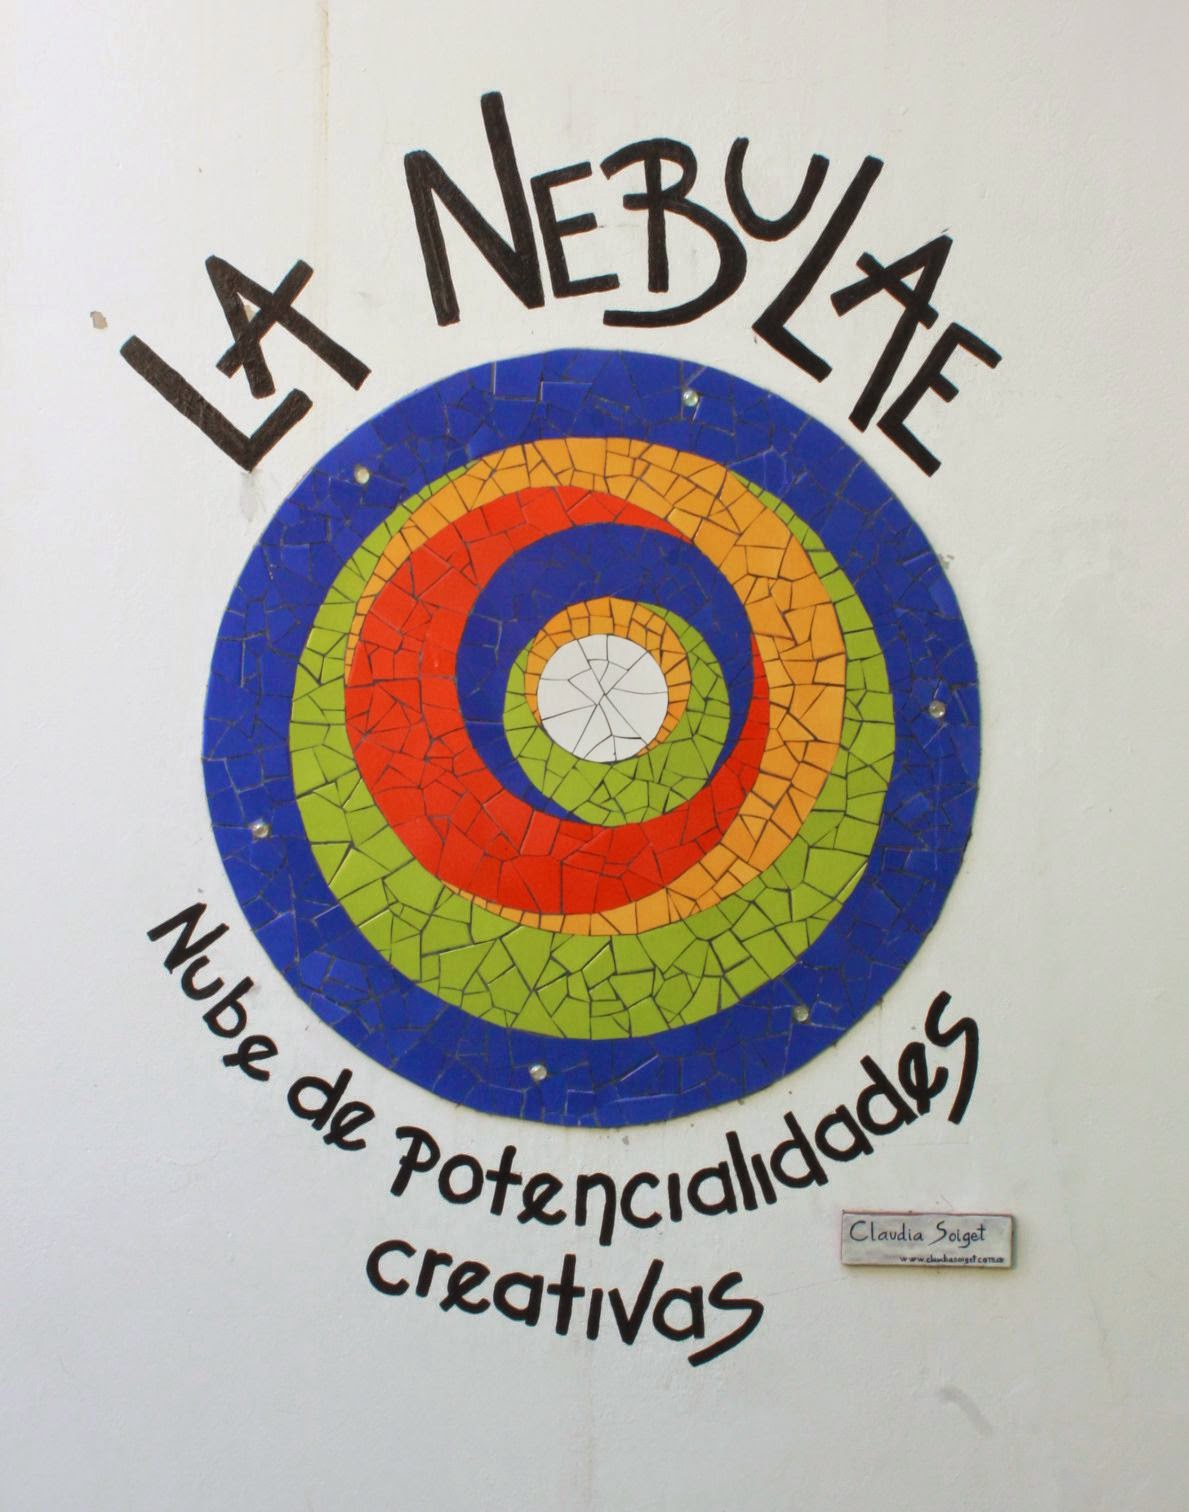 Compa a de mosaicos la nebulae mural en el jard n for Diseno curricular de jardin maternal